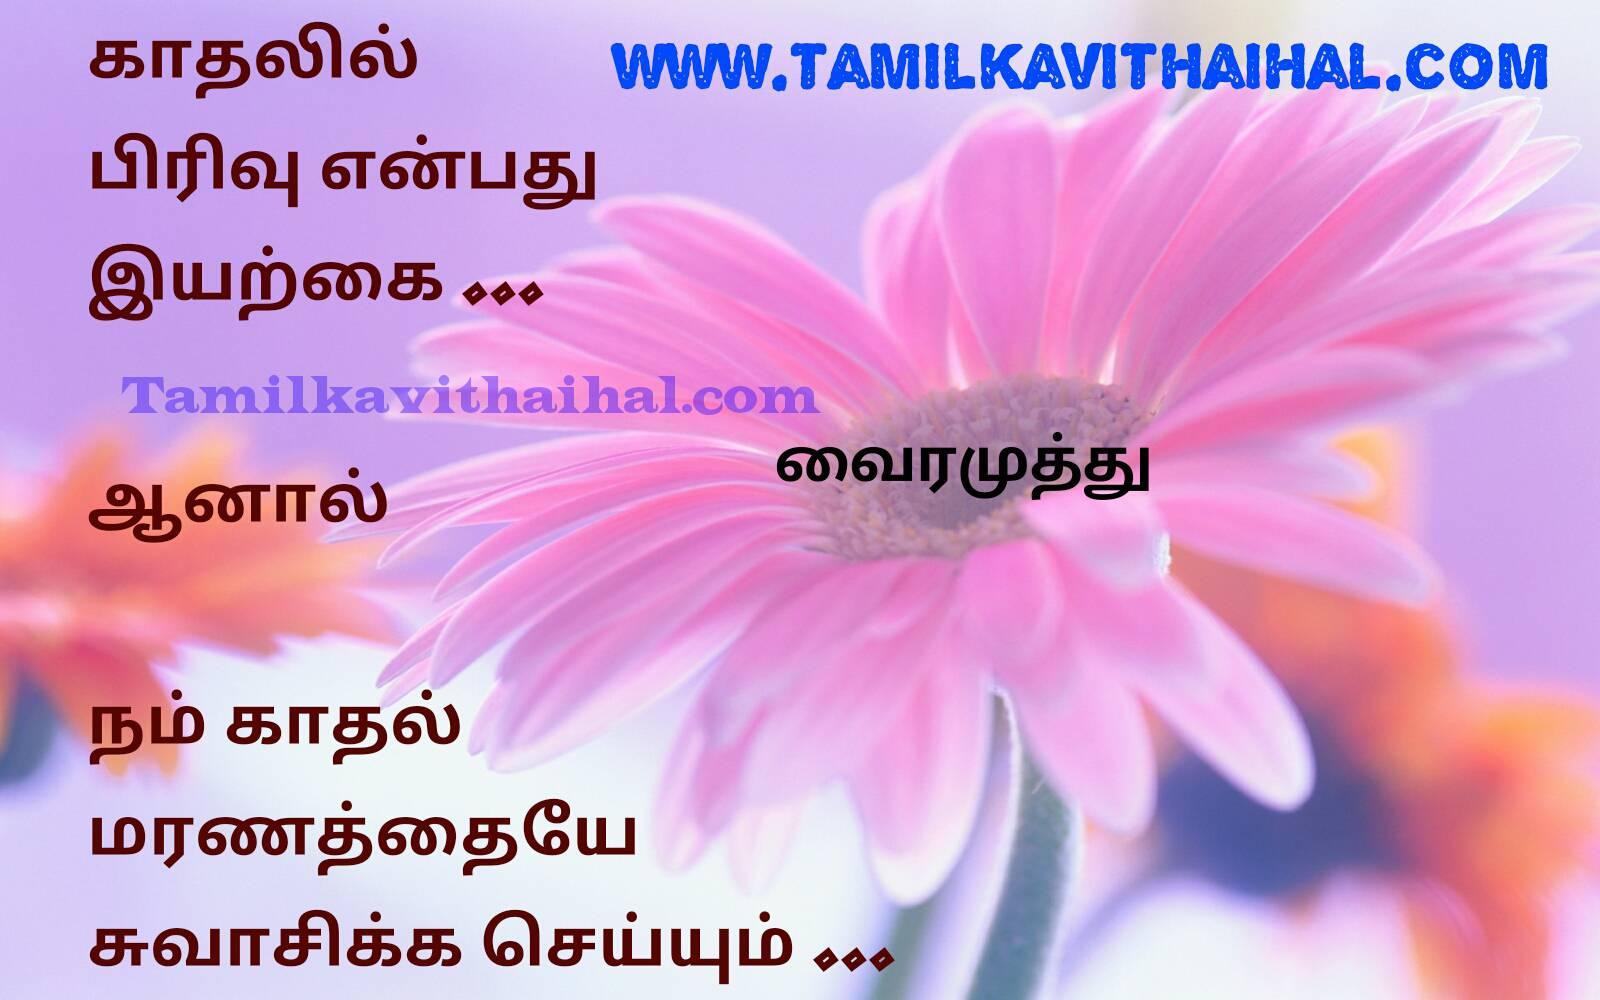 Kaviperarasu vairamuthu kavithaigal in tamil beautiful lovers feel maranam iyarkkai pirivu hd image download